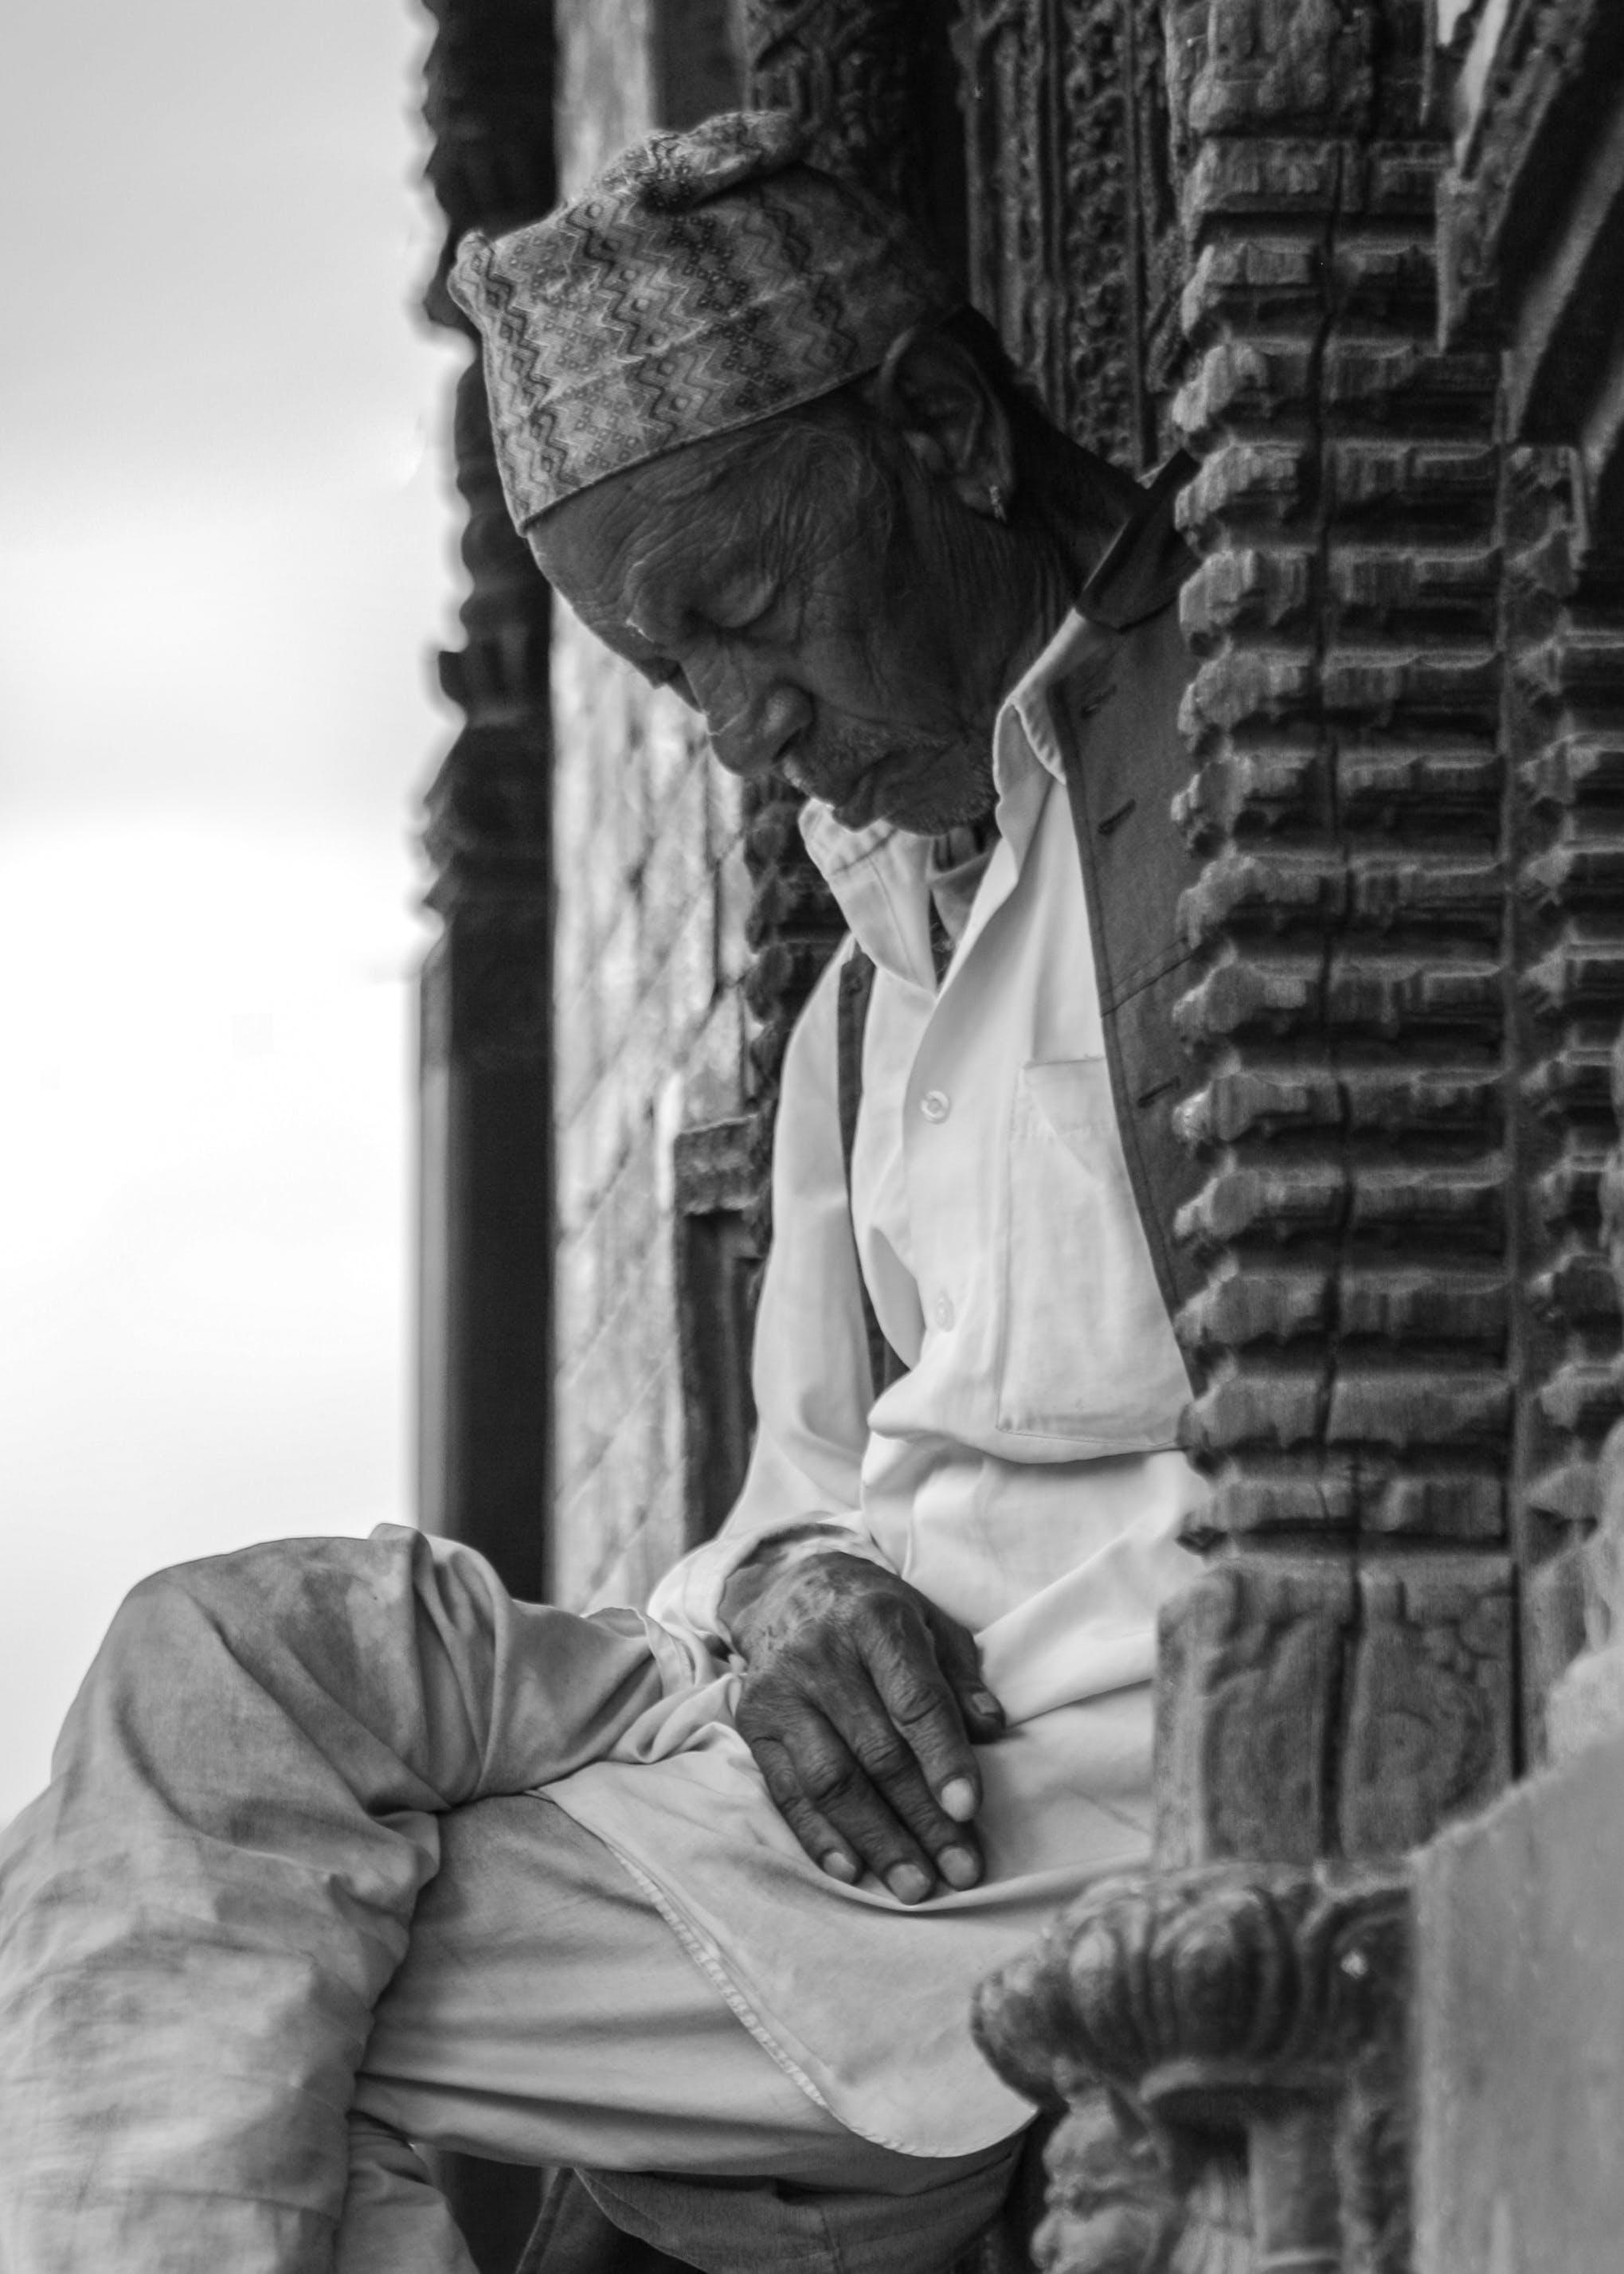 Grayscale Photo of Man Sleeping